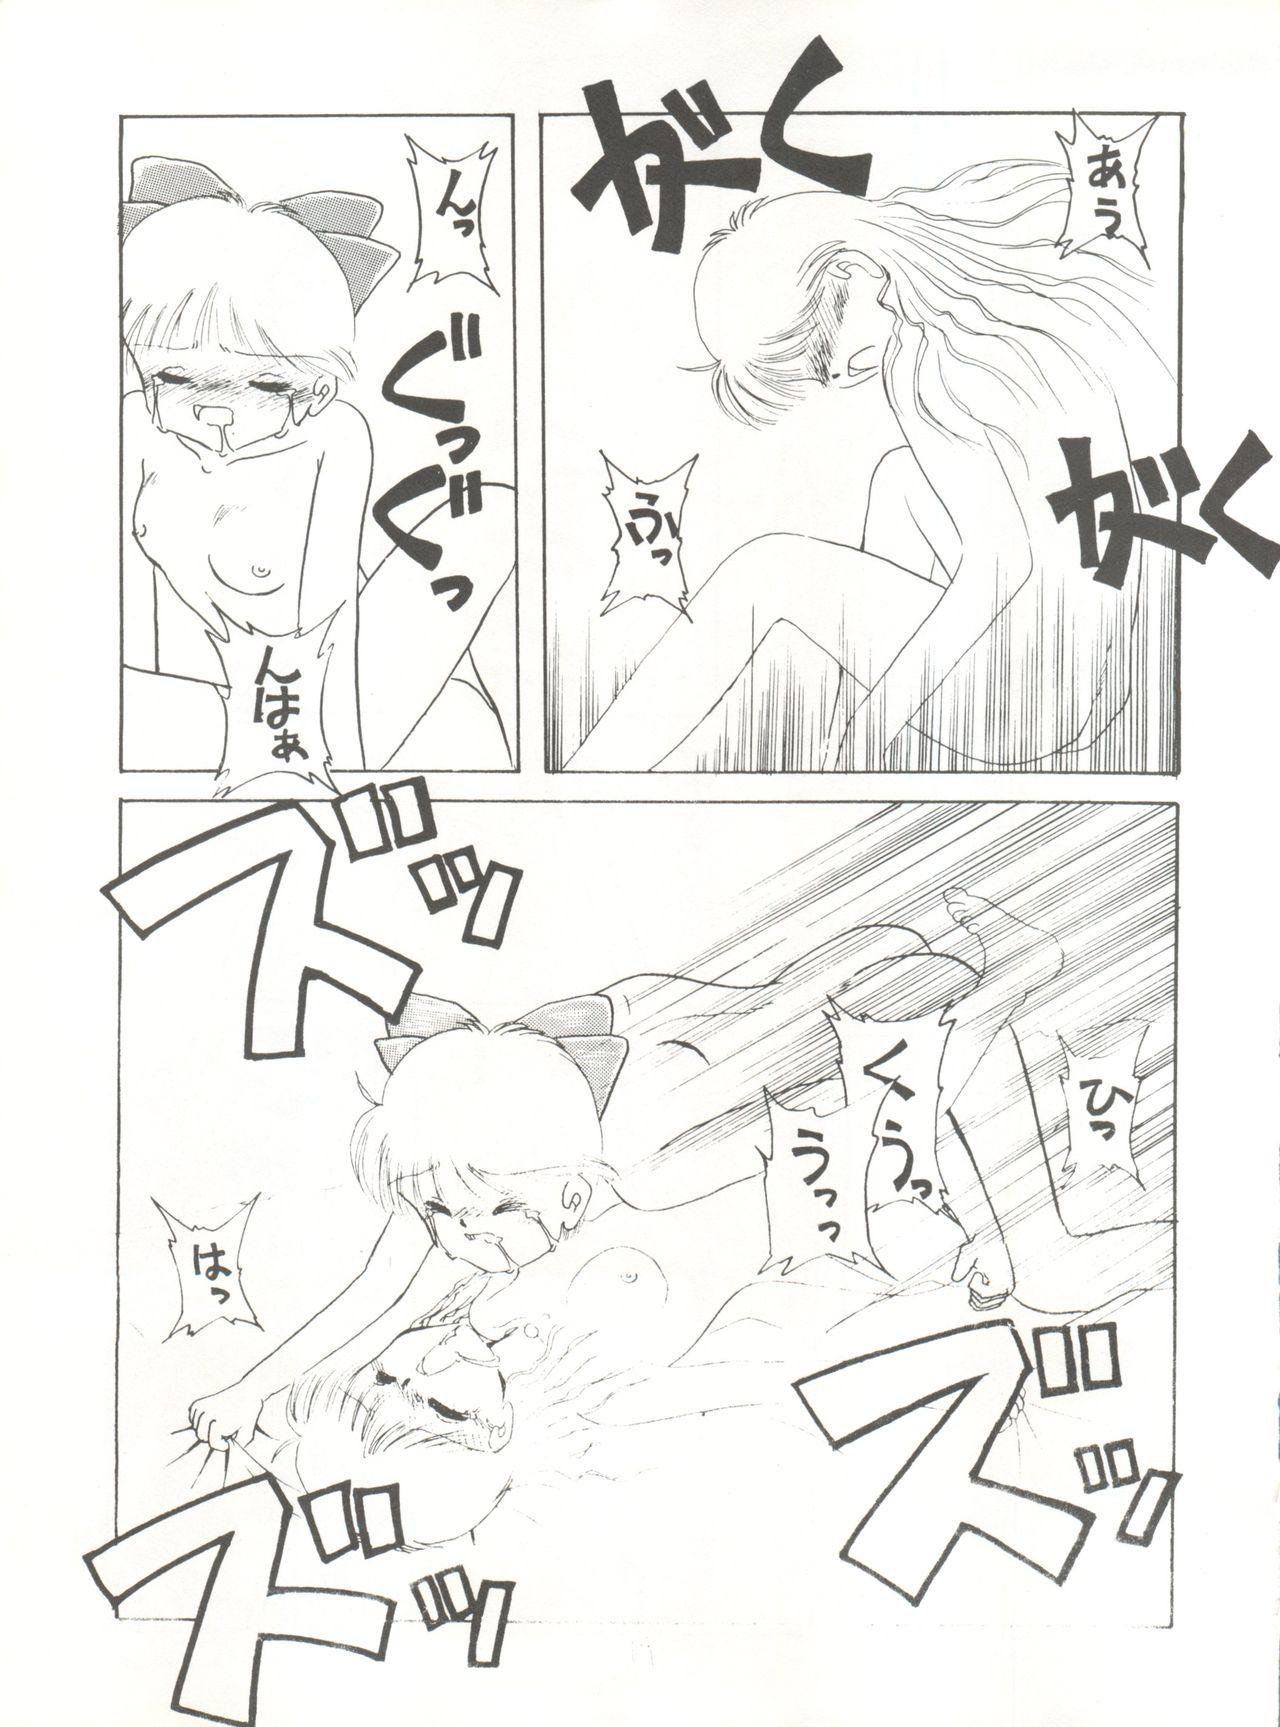 [Global One (MARO)] Sadistic 5 (Cutey Honey, Devilman, Sailor Moon), [Global One (MARO)] Sadistic (Dirty Pair, Fushigi no Umi no Nadia, Sailor Moon), [Studio Ikkatsumajin] .ribbon (Hime-chan's Ribbon) 142